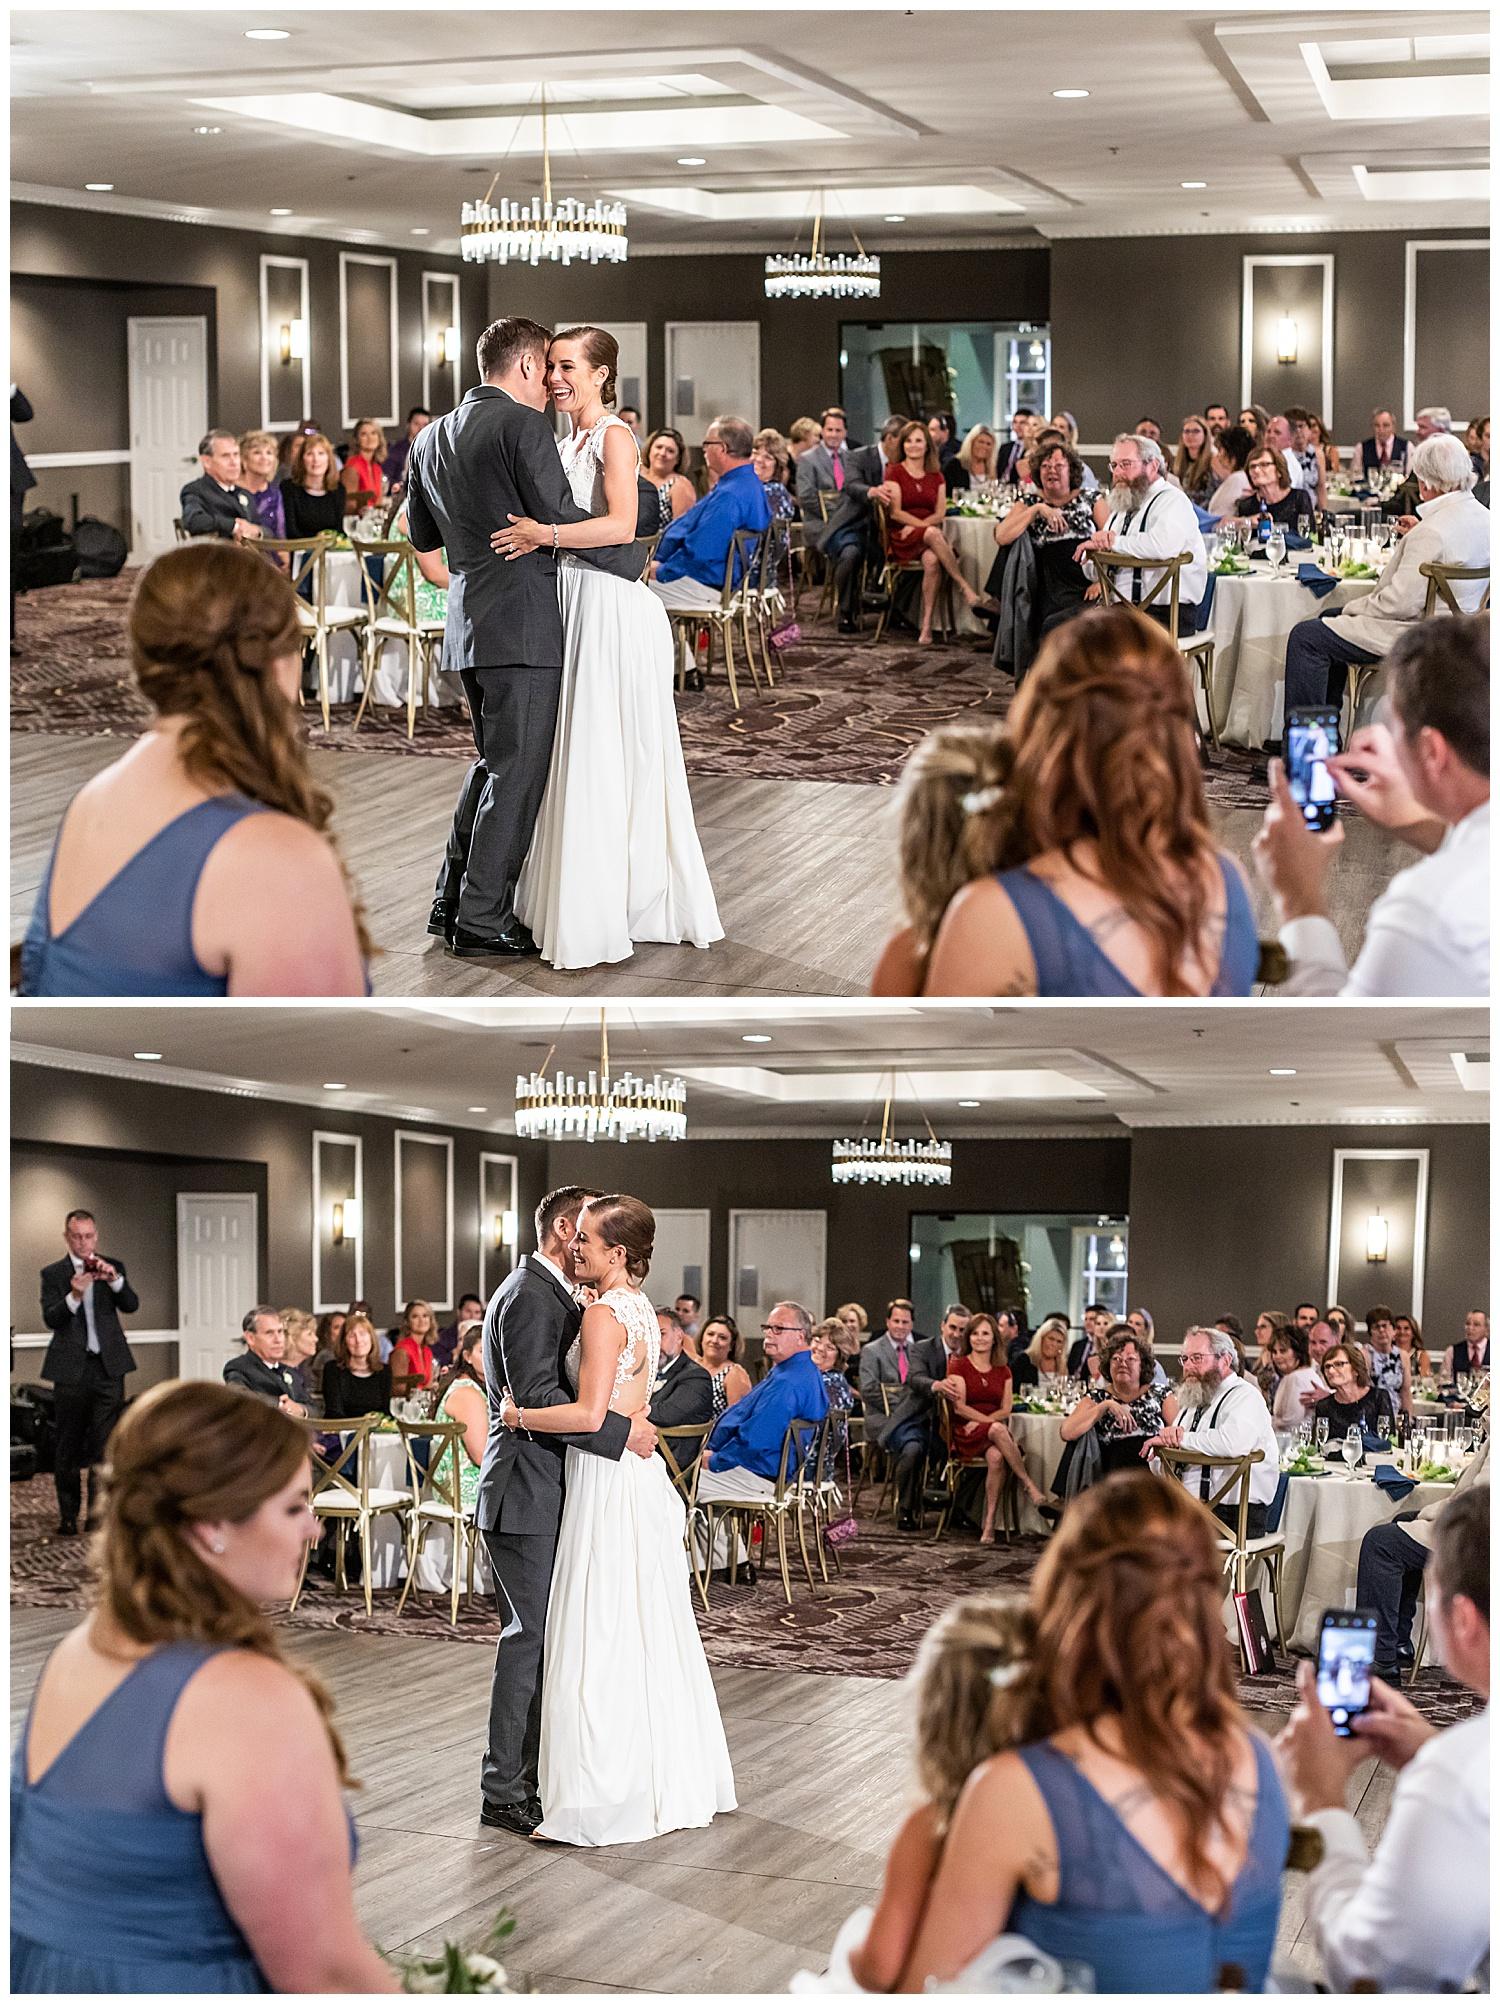 Lindsay Josh Eagles Nest Country Club Wedding Living Radiant Photography photos_0108.jpg